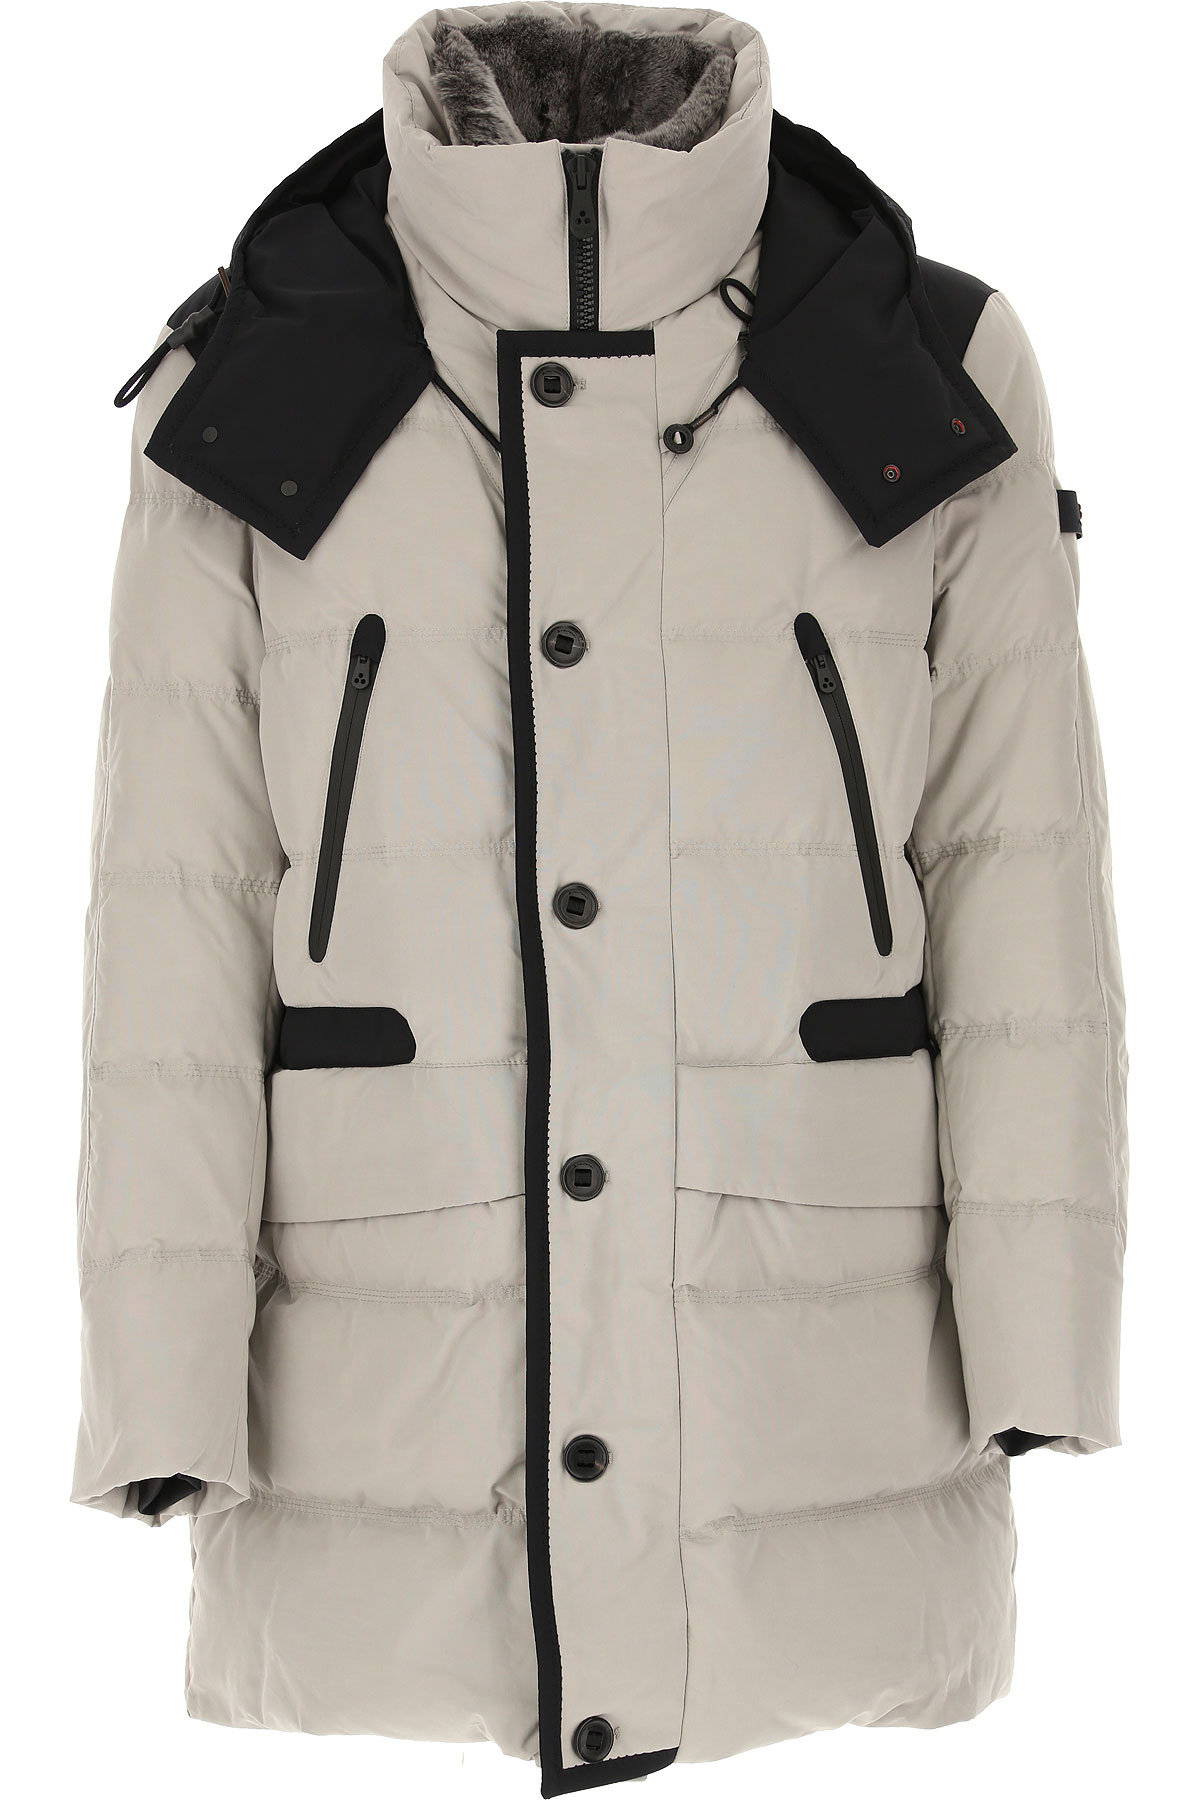 Peuterey Down Jacket for Men, Puffer Ski Jacket On Sale, Light Turtledove Grey, Down, 2019, M S